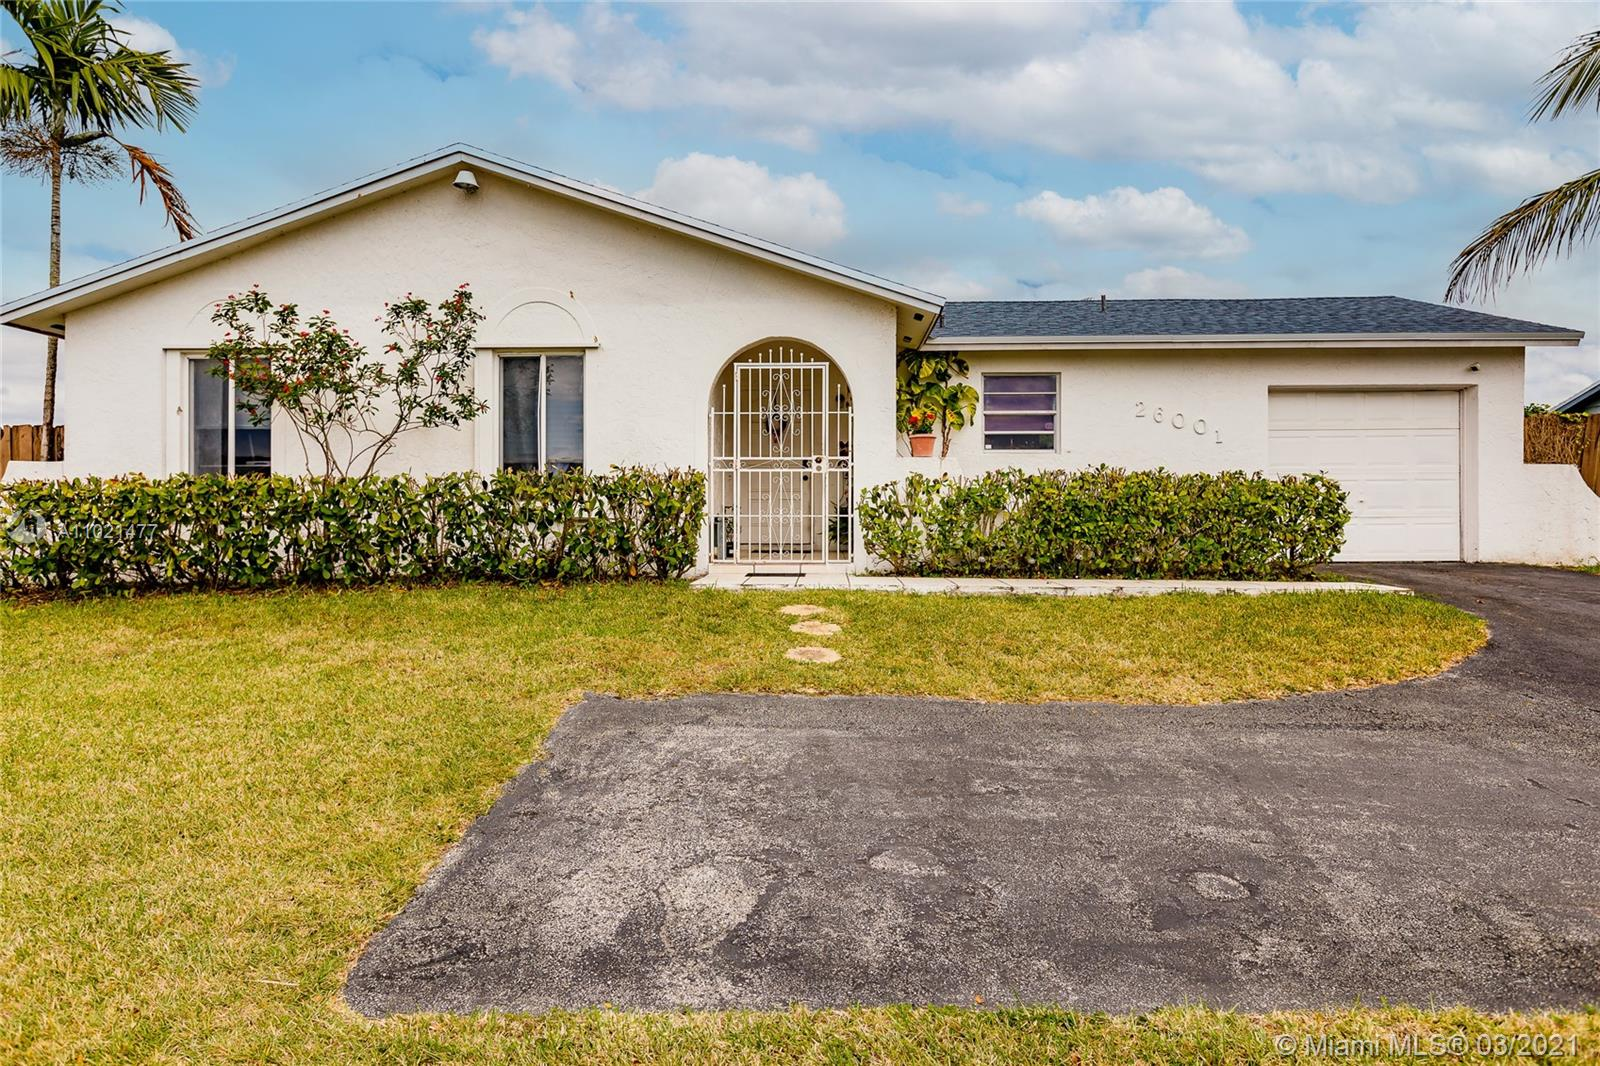 26001 Sw 132nd Ave Property Photo